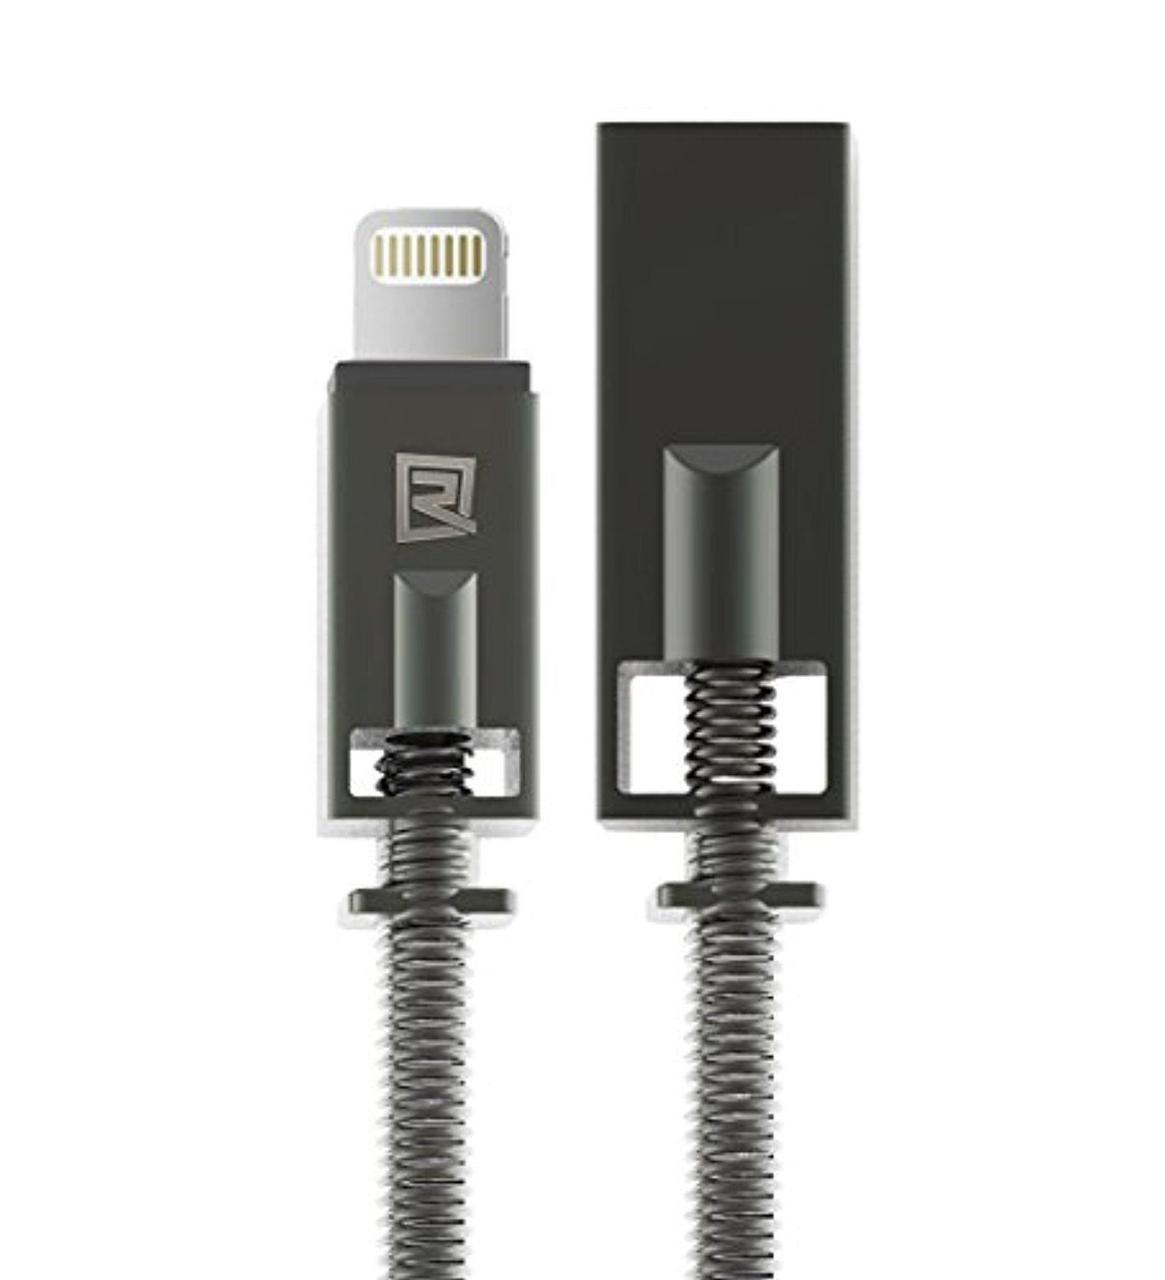 USB кабель Remax Lightning Royalty RC-056i 2.1A 1m black